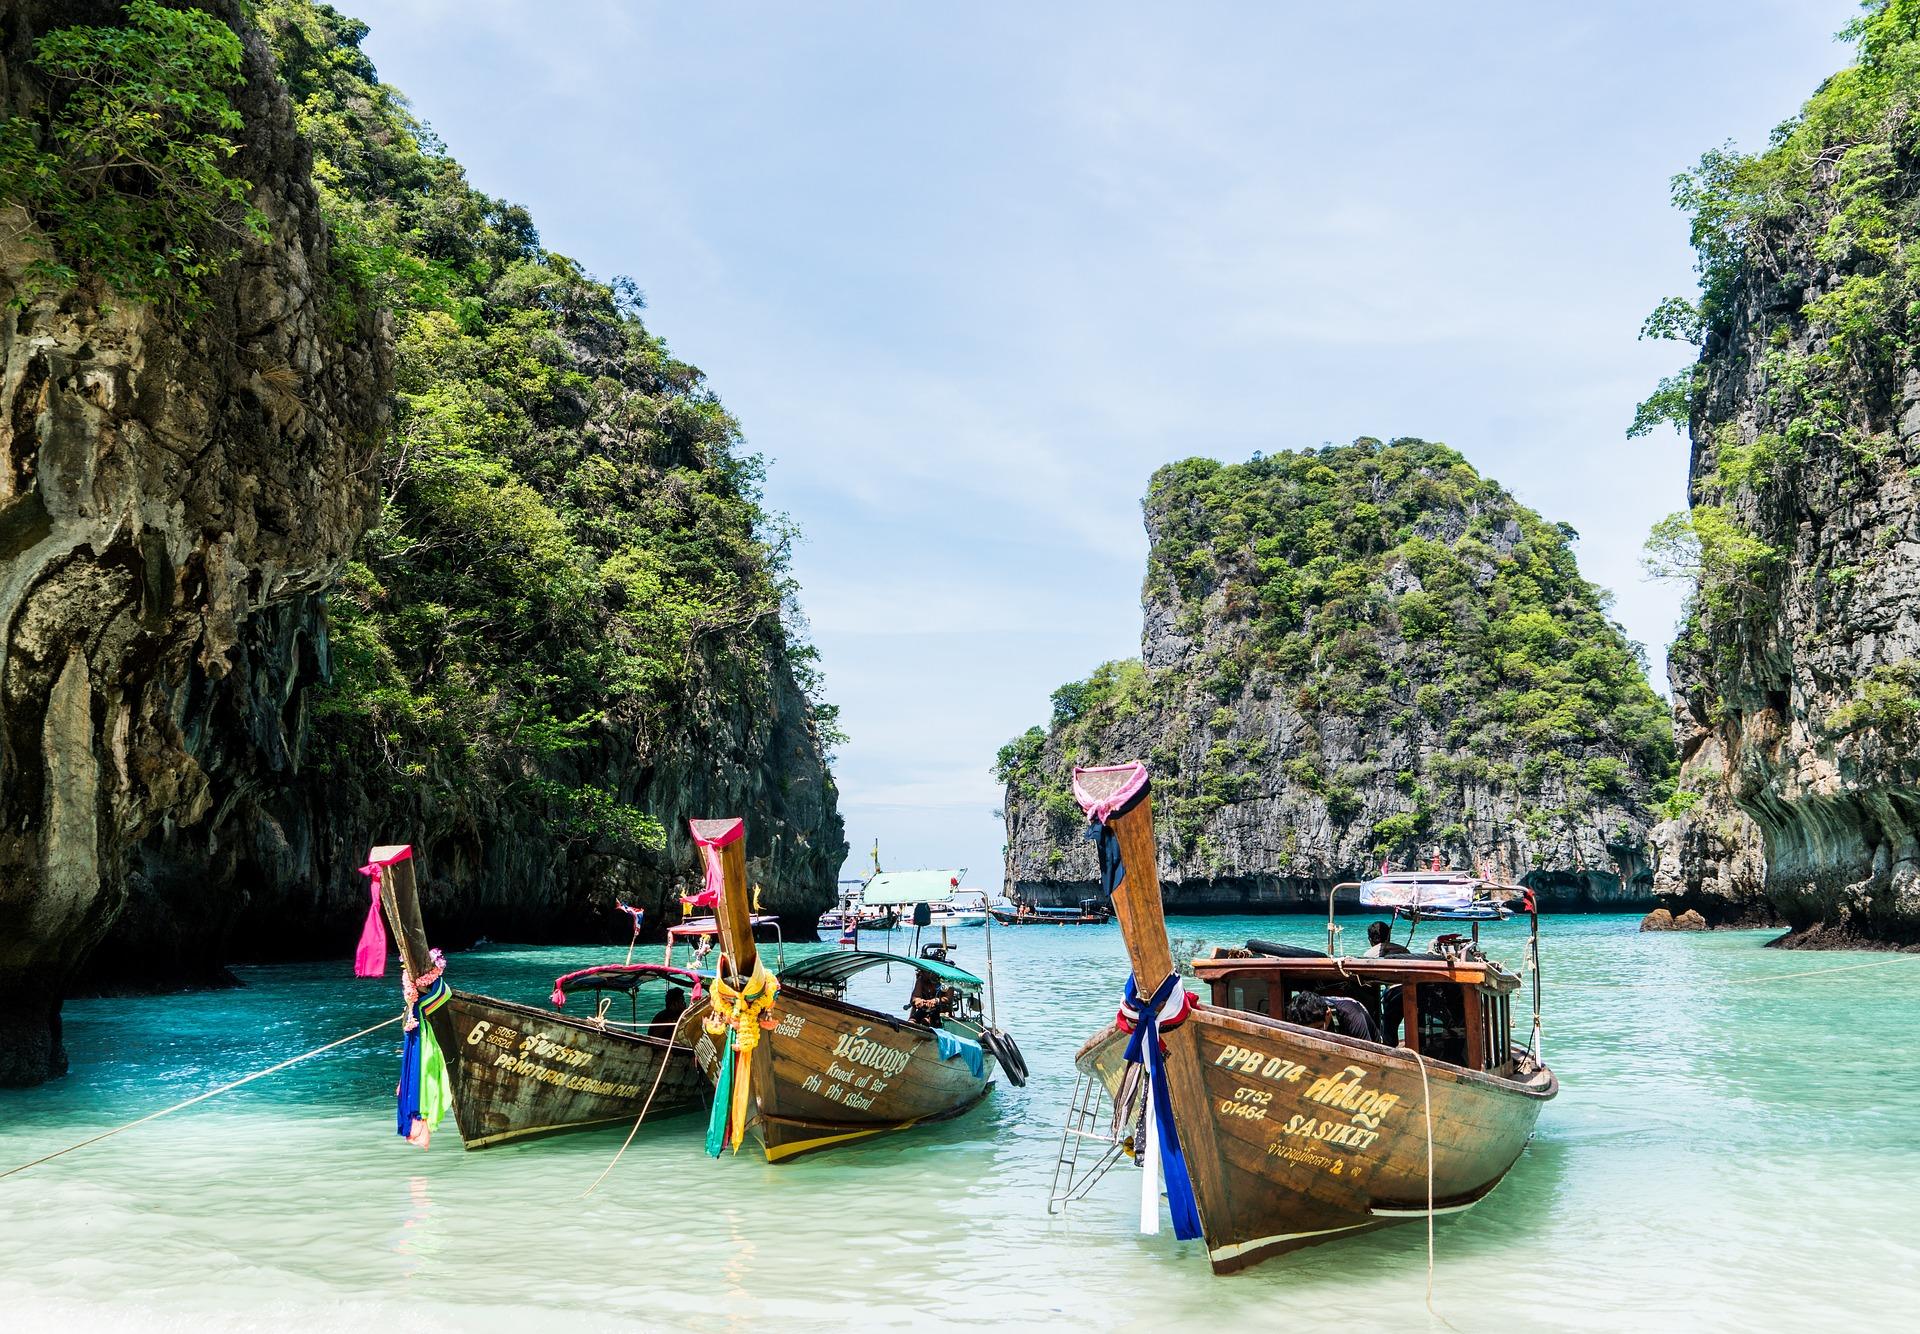 Pauschalreise Phuket Patong Beach - Thailand 11 Tage günstig ab 515,00€